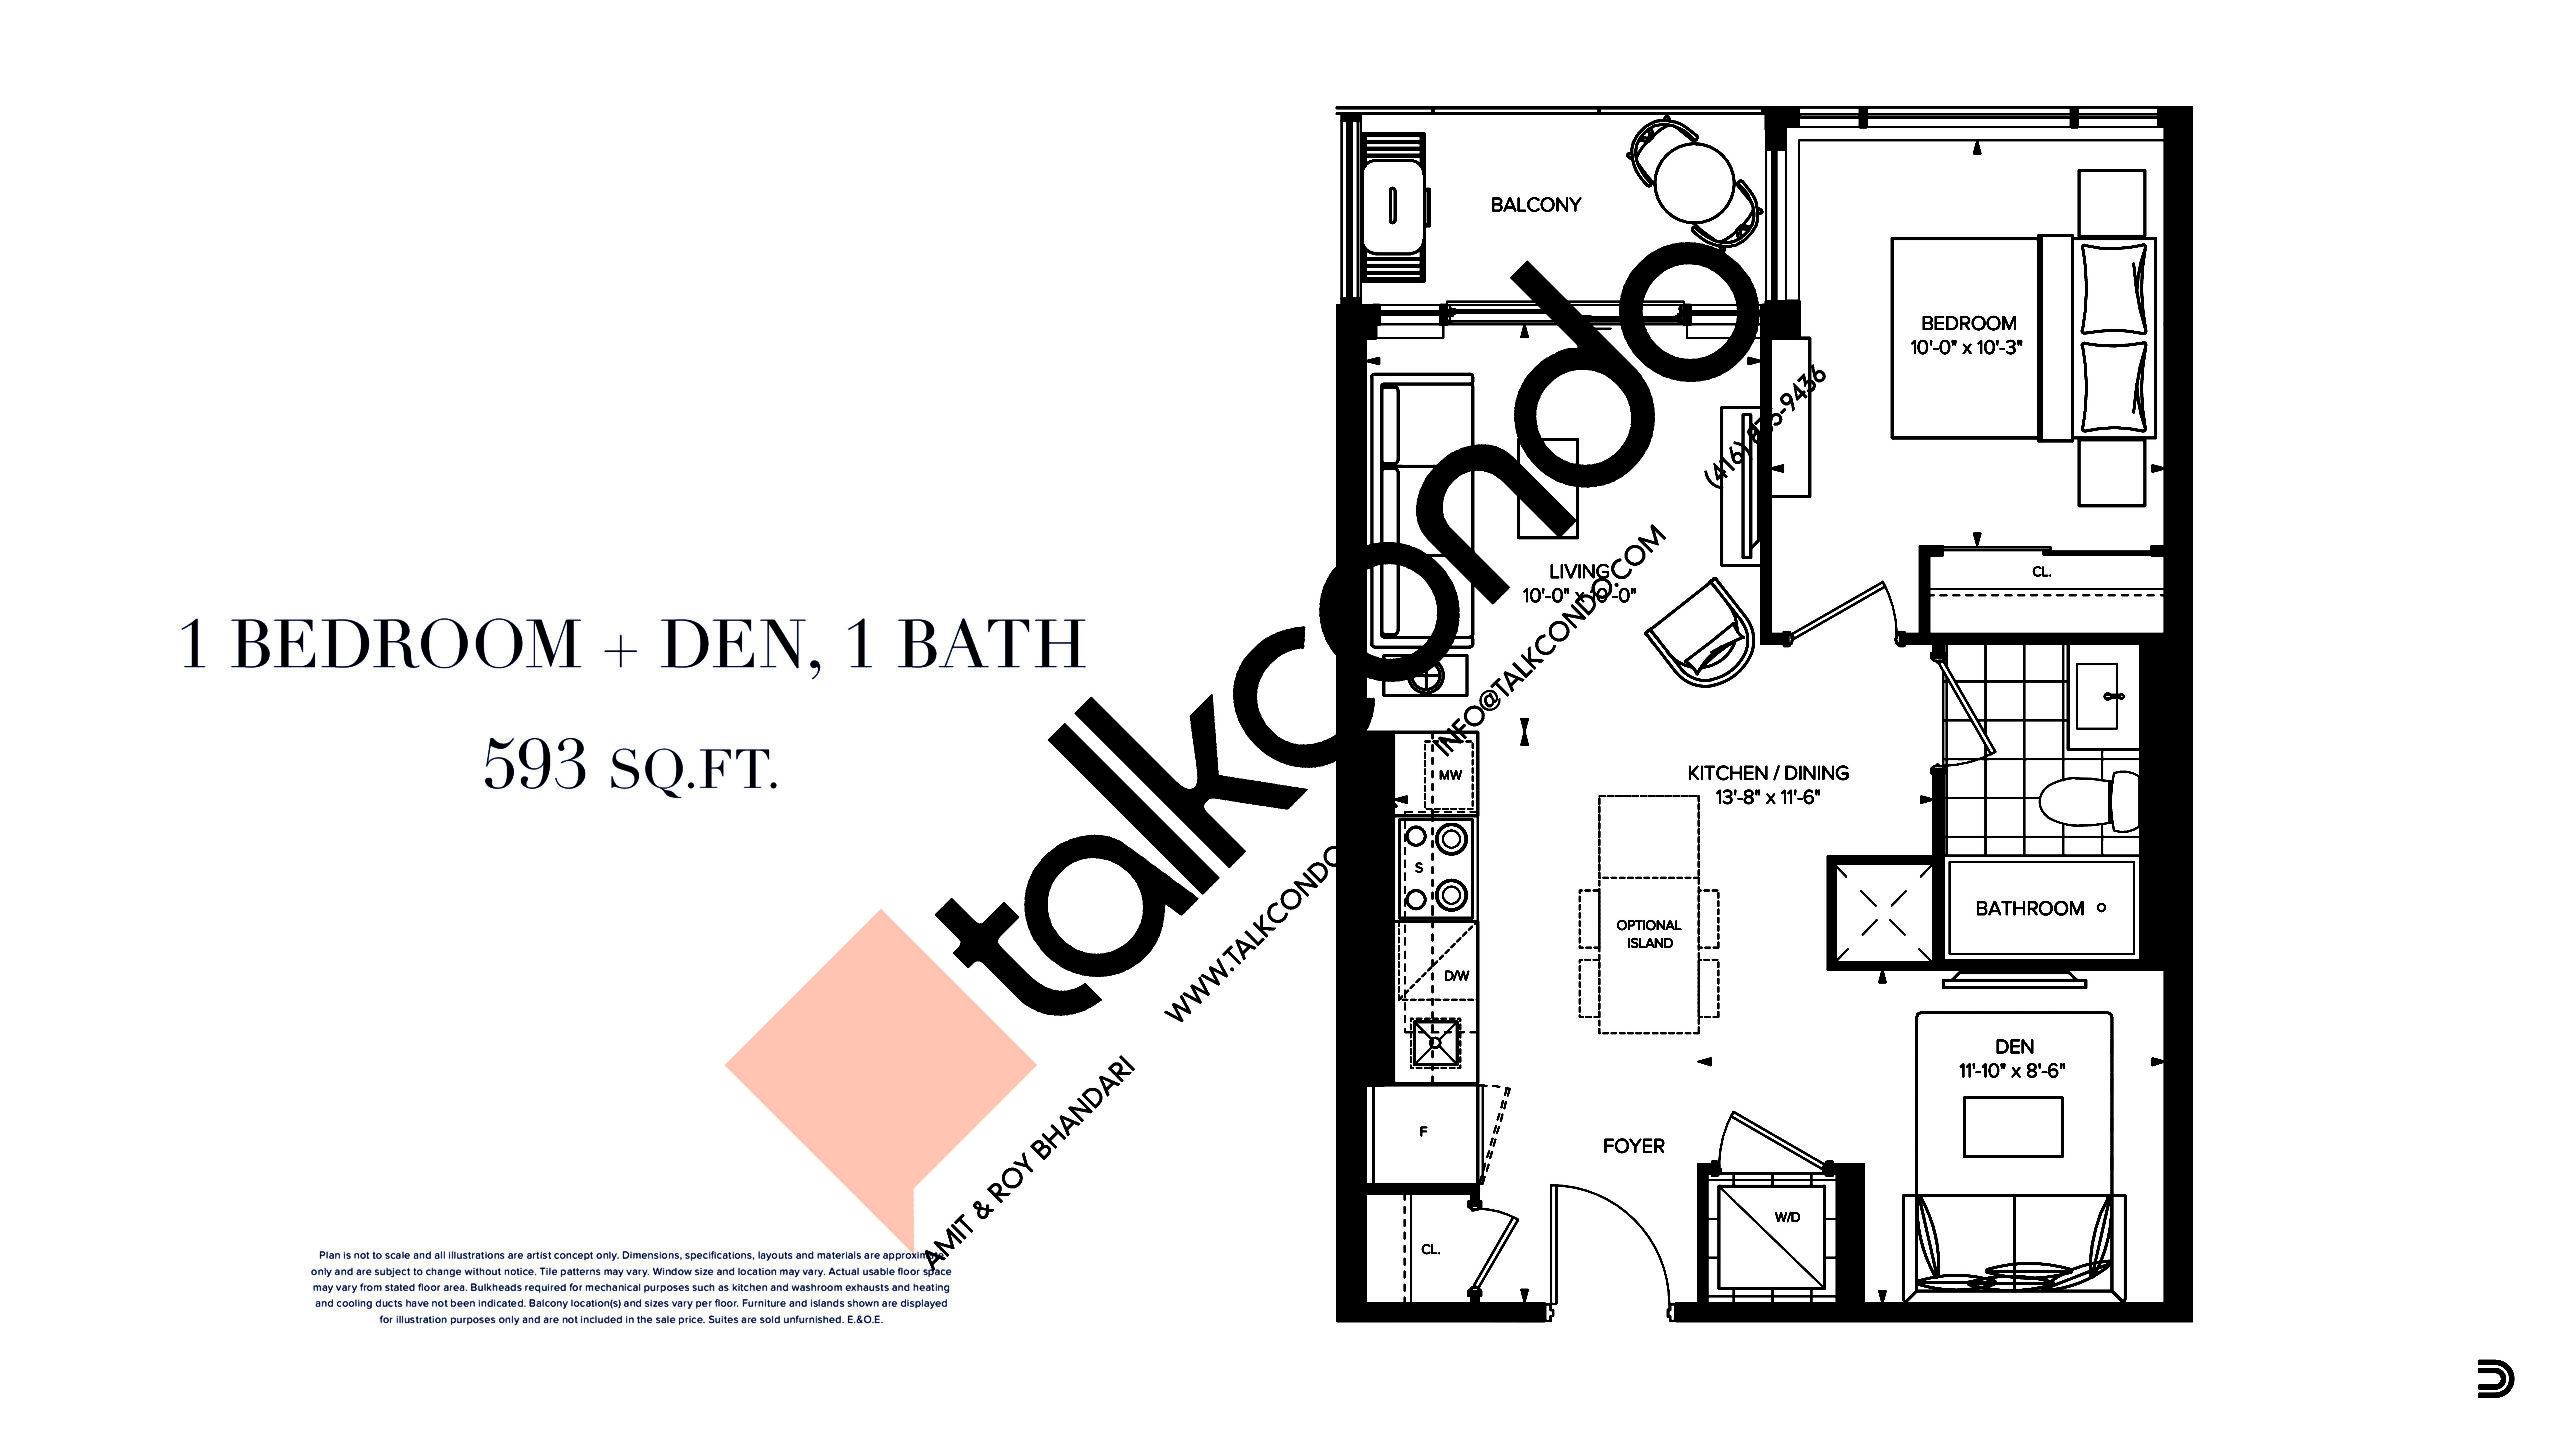 593 SF Floor Plan at Distrikt Trailside 2.0 Condos - 593 sq.ft